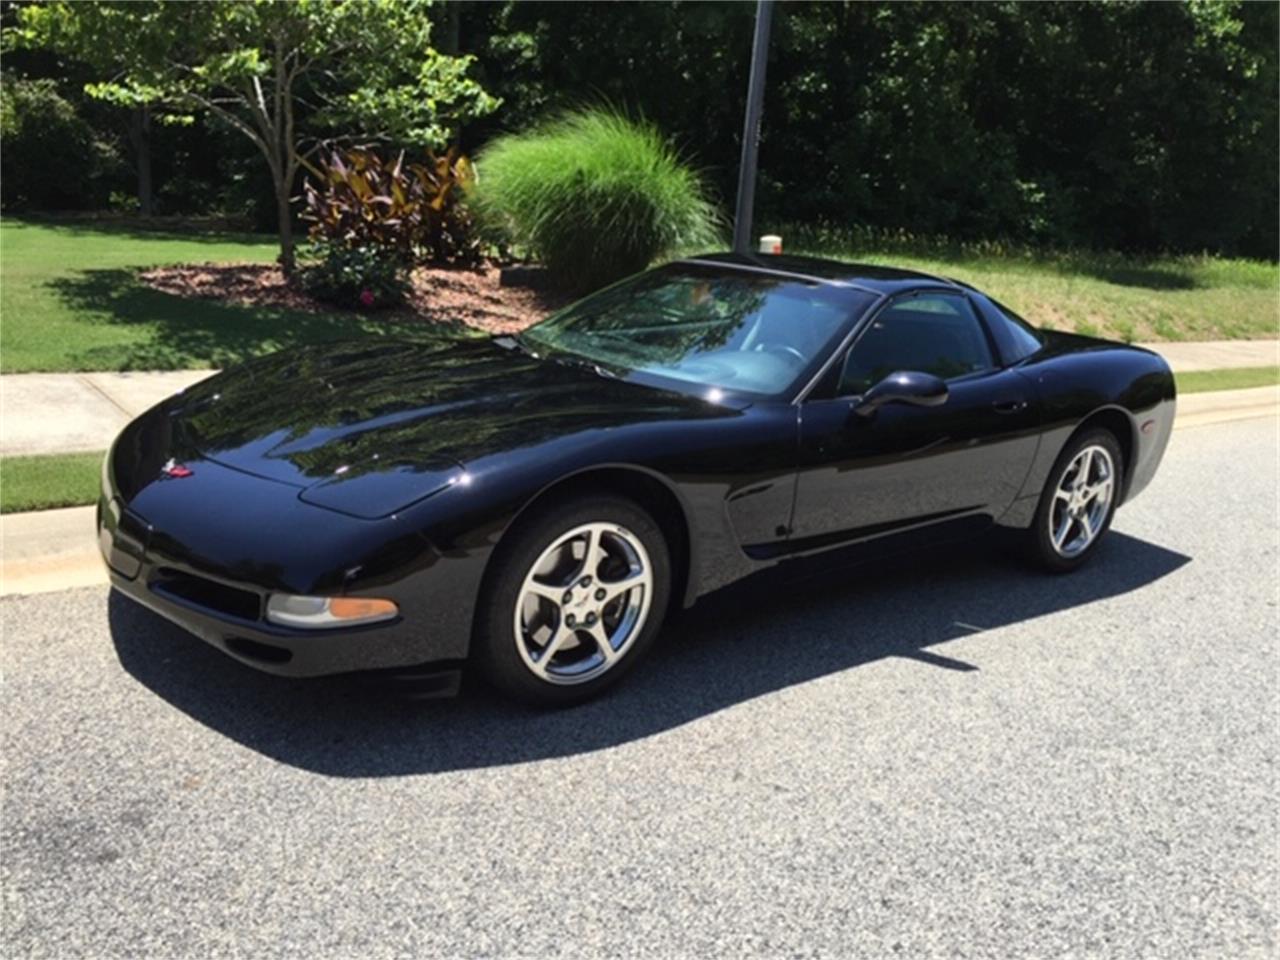 Large Picture of '02 Corvette located in Georgia - PFIC